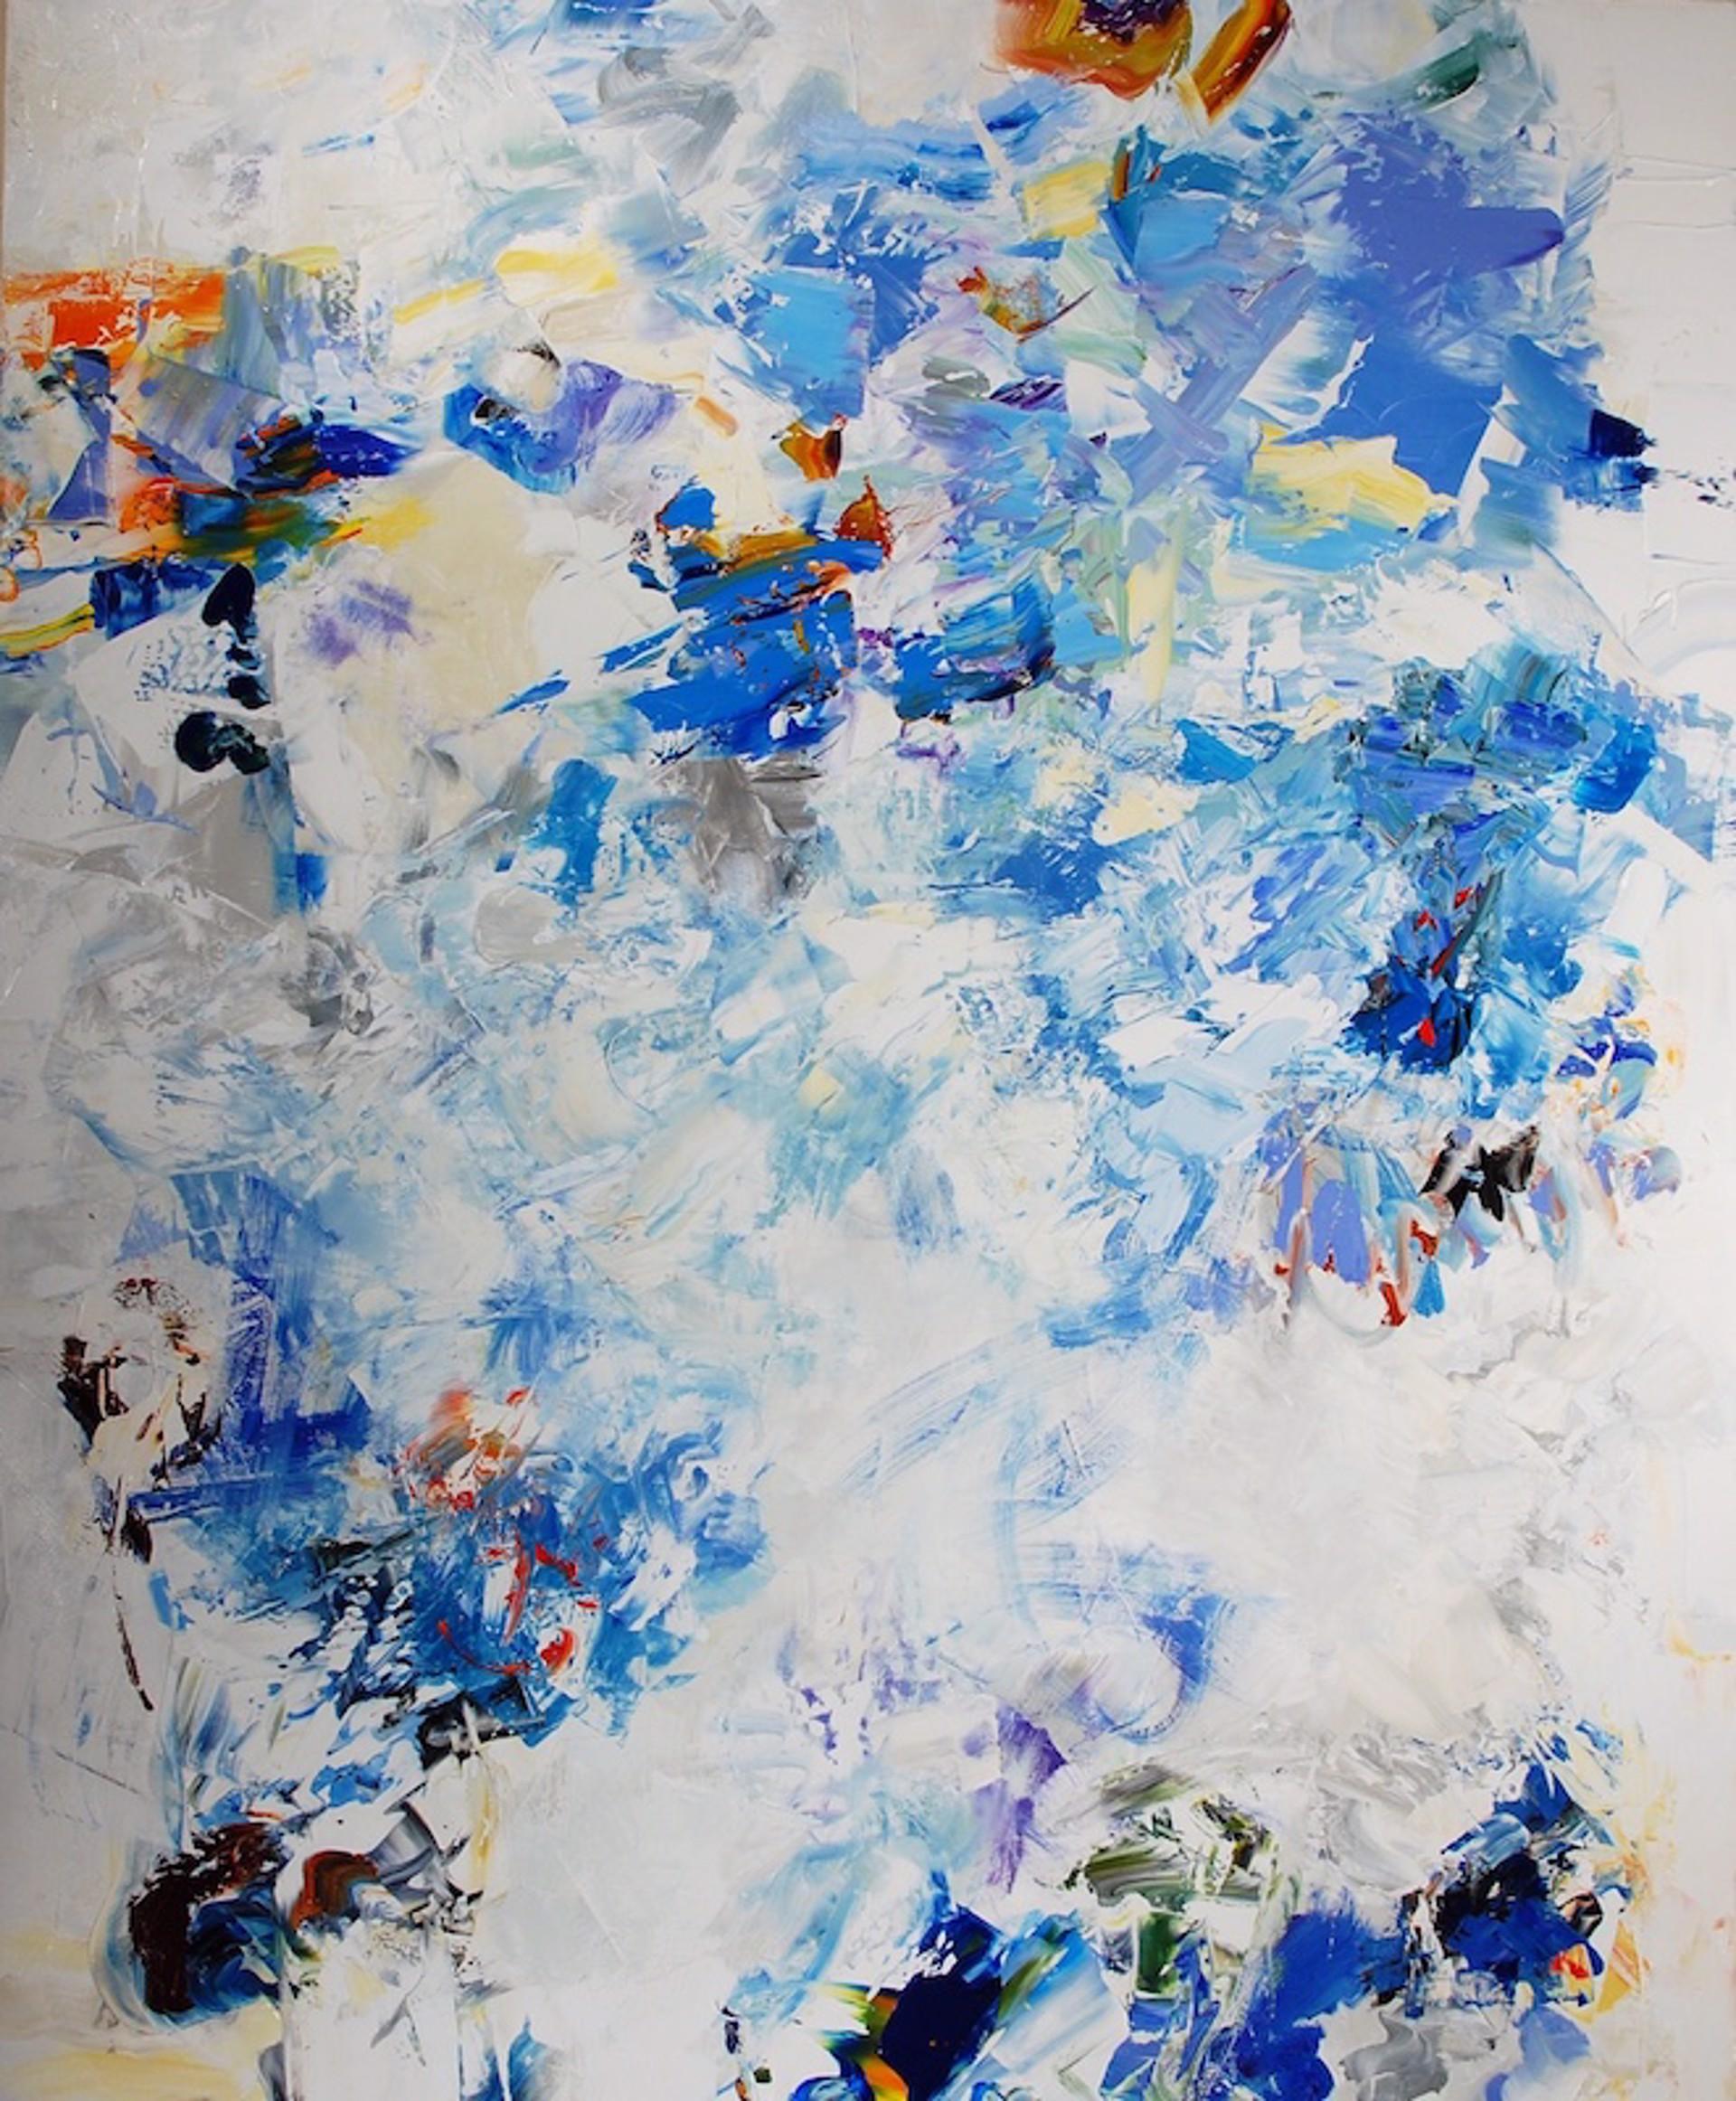 Blue Drift by Christine Hayman